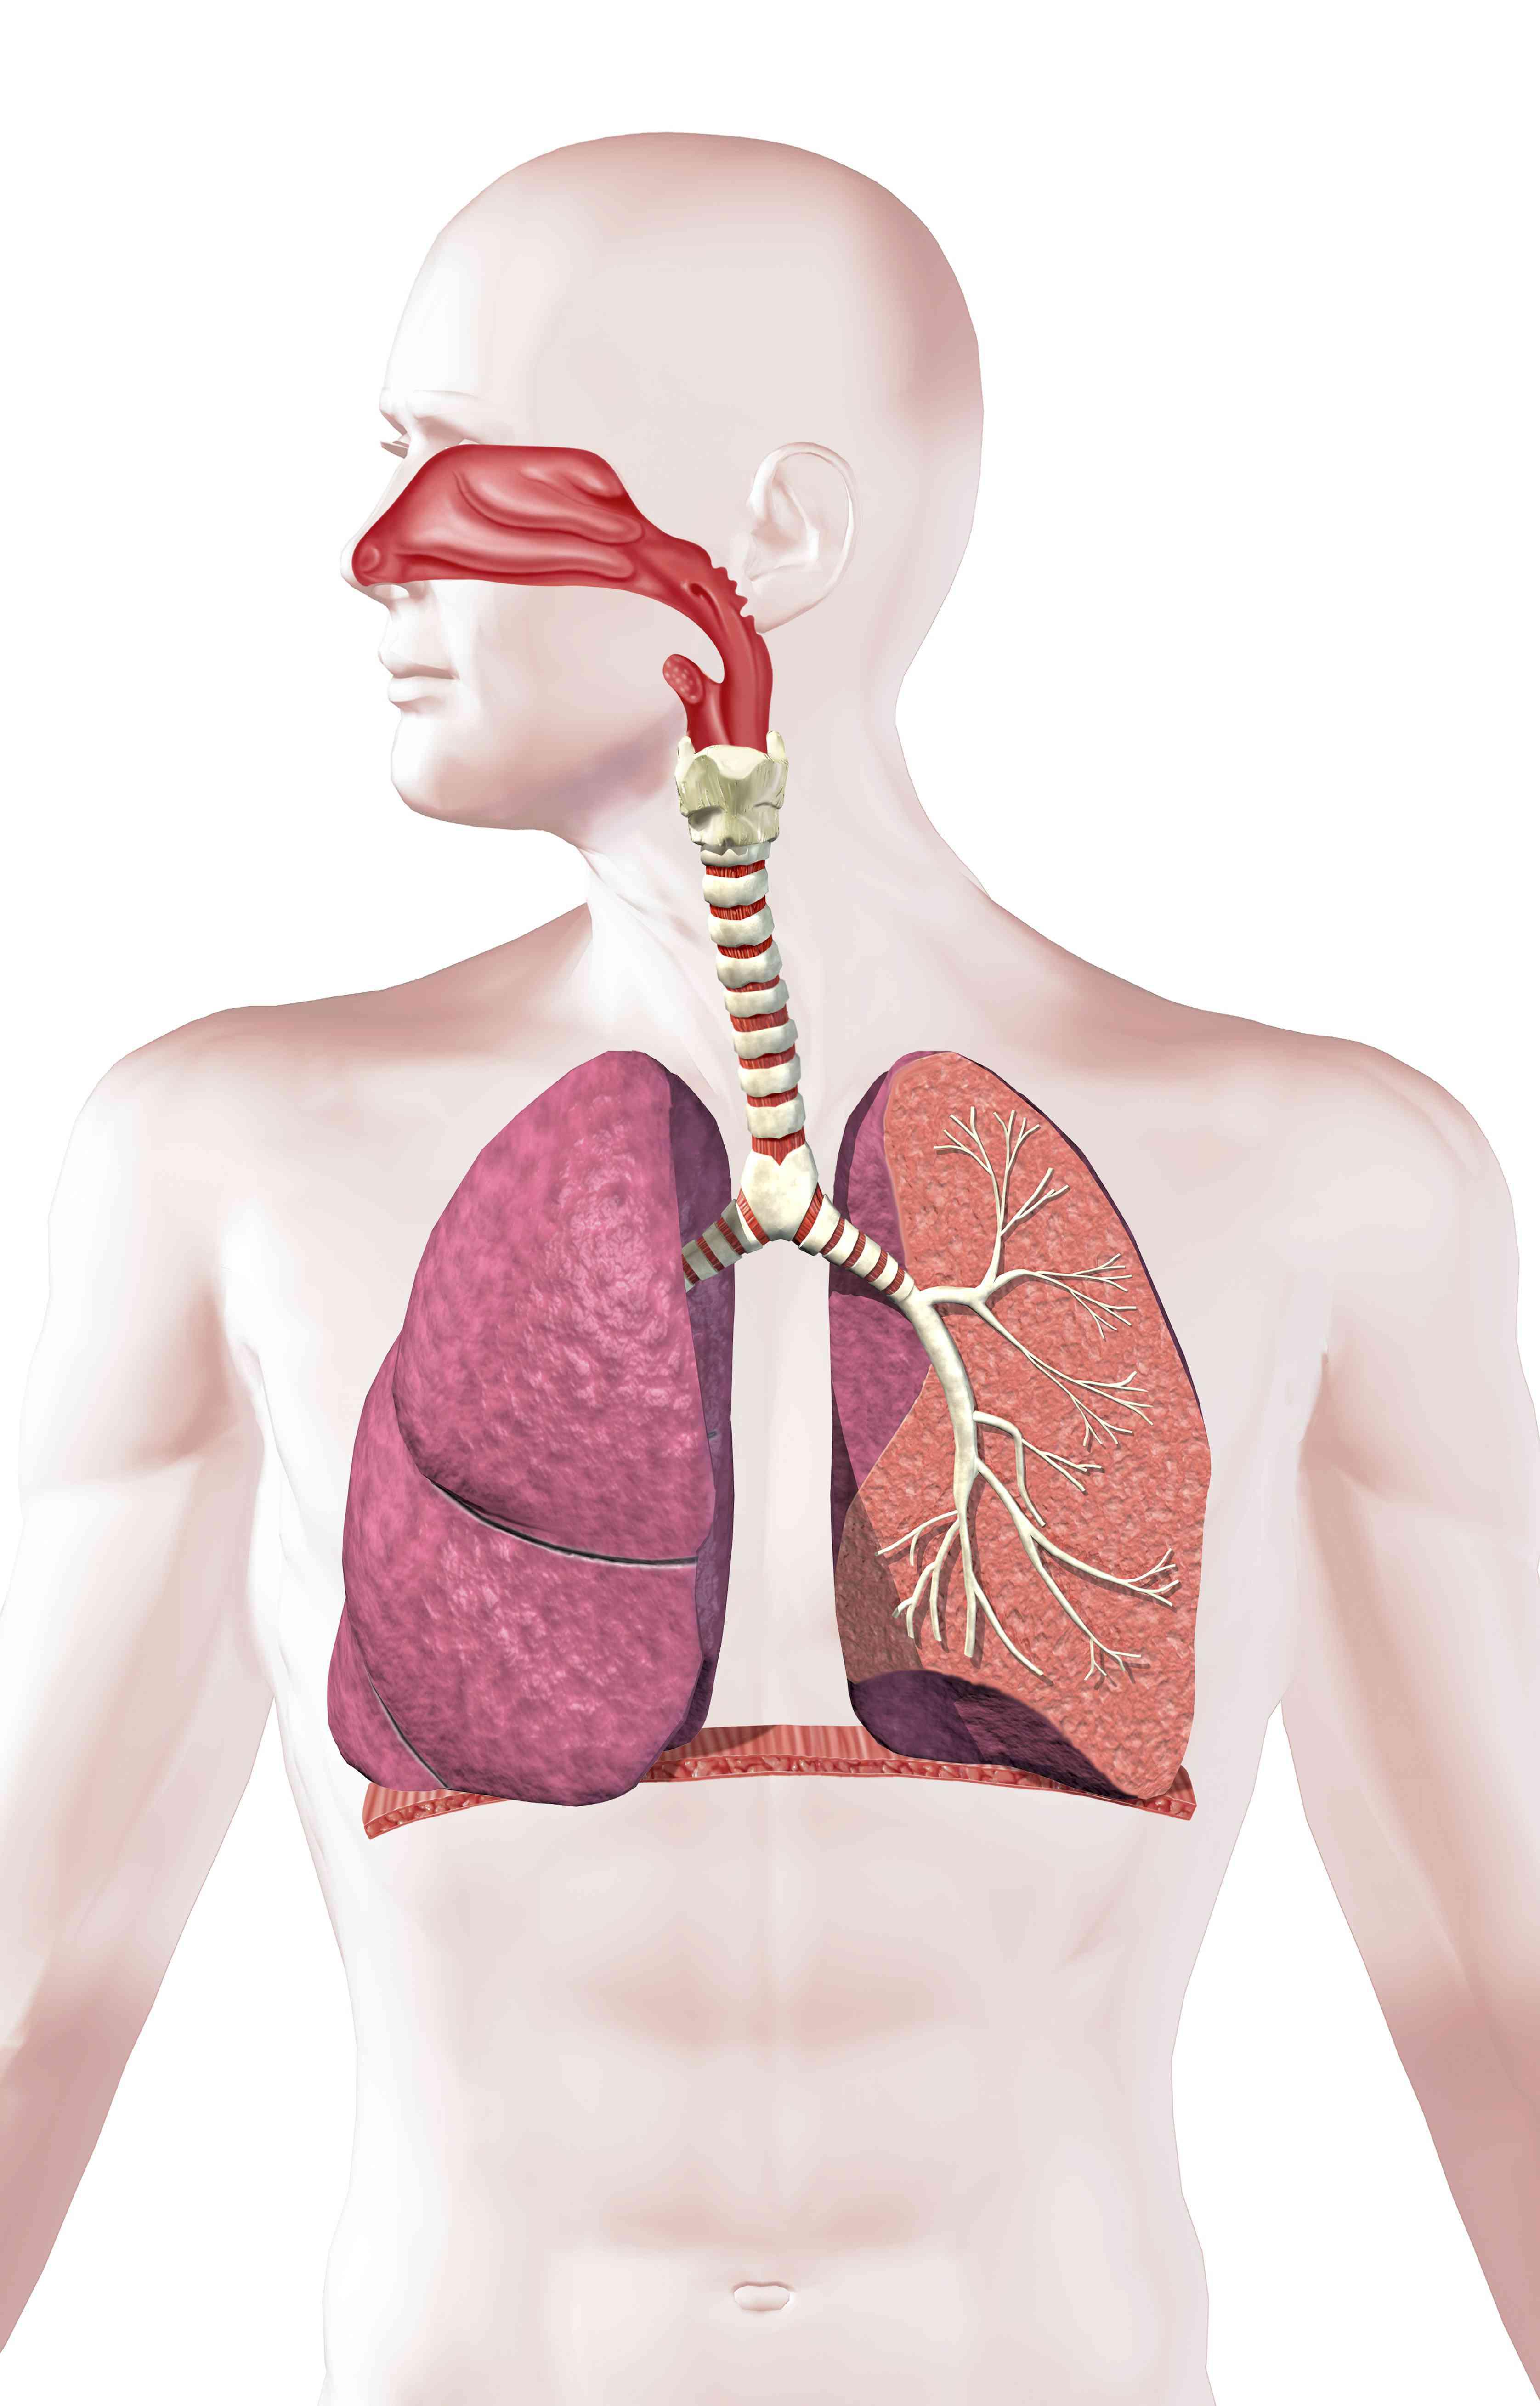 Digital illustration of the human respiratory system.